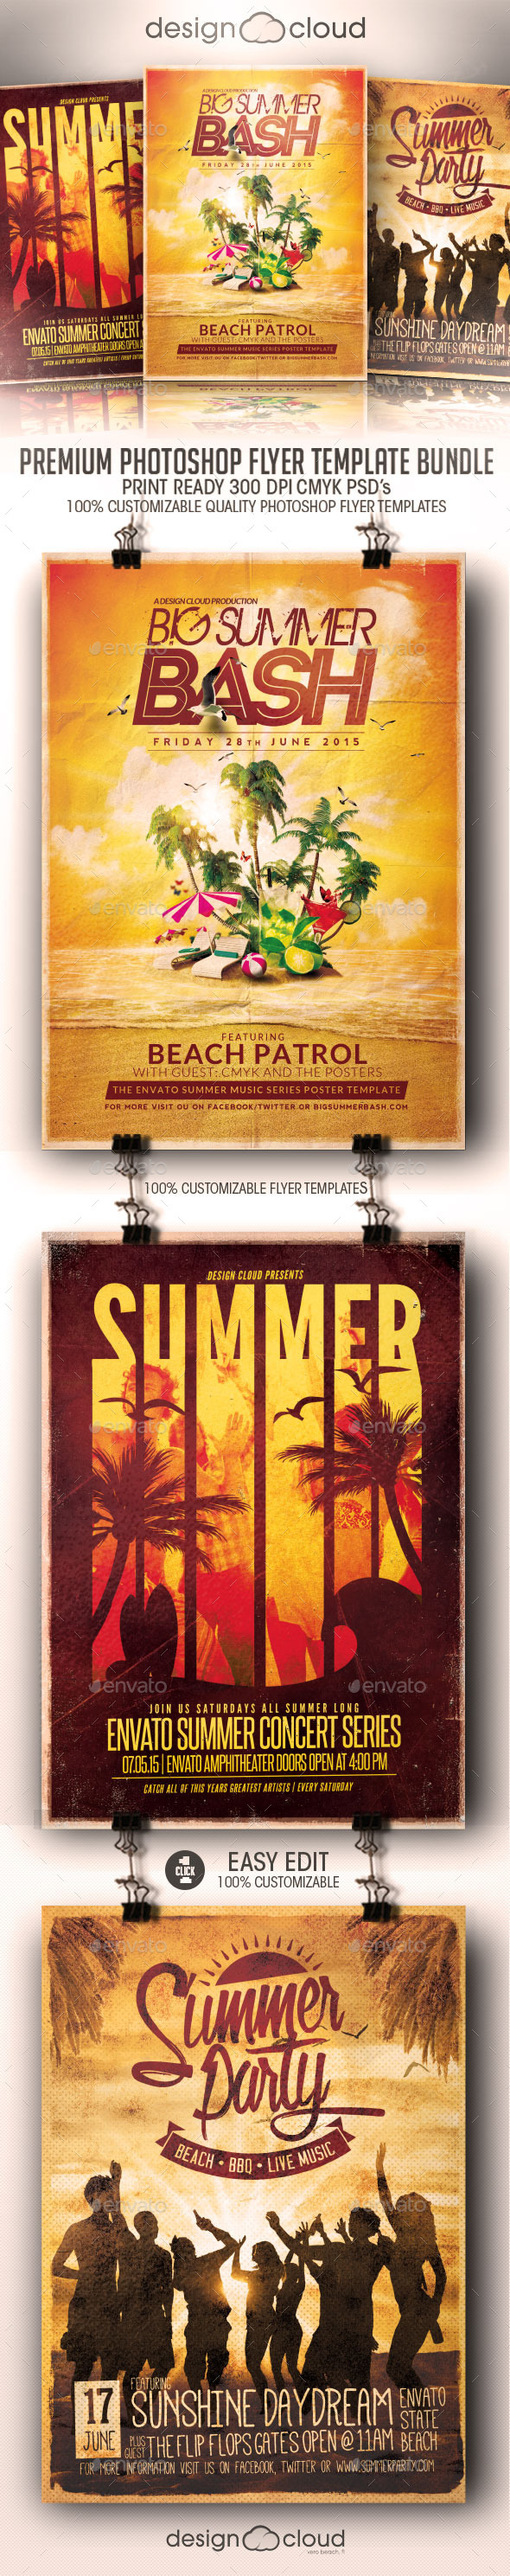 Super Summer Flyer Template Bundle Vol. 1 - Clubs & Parties Events